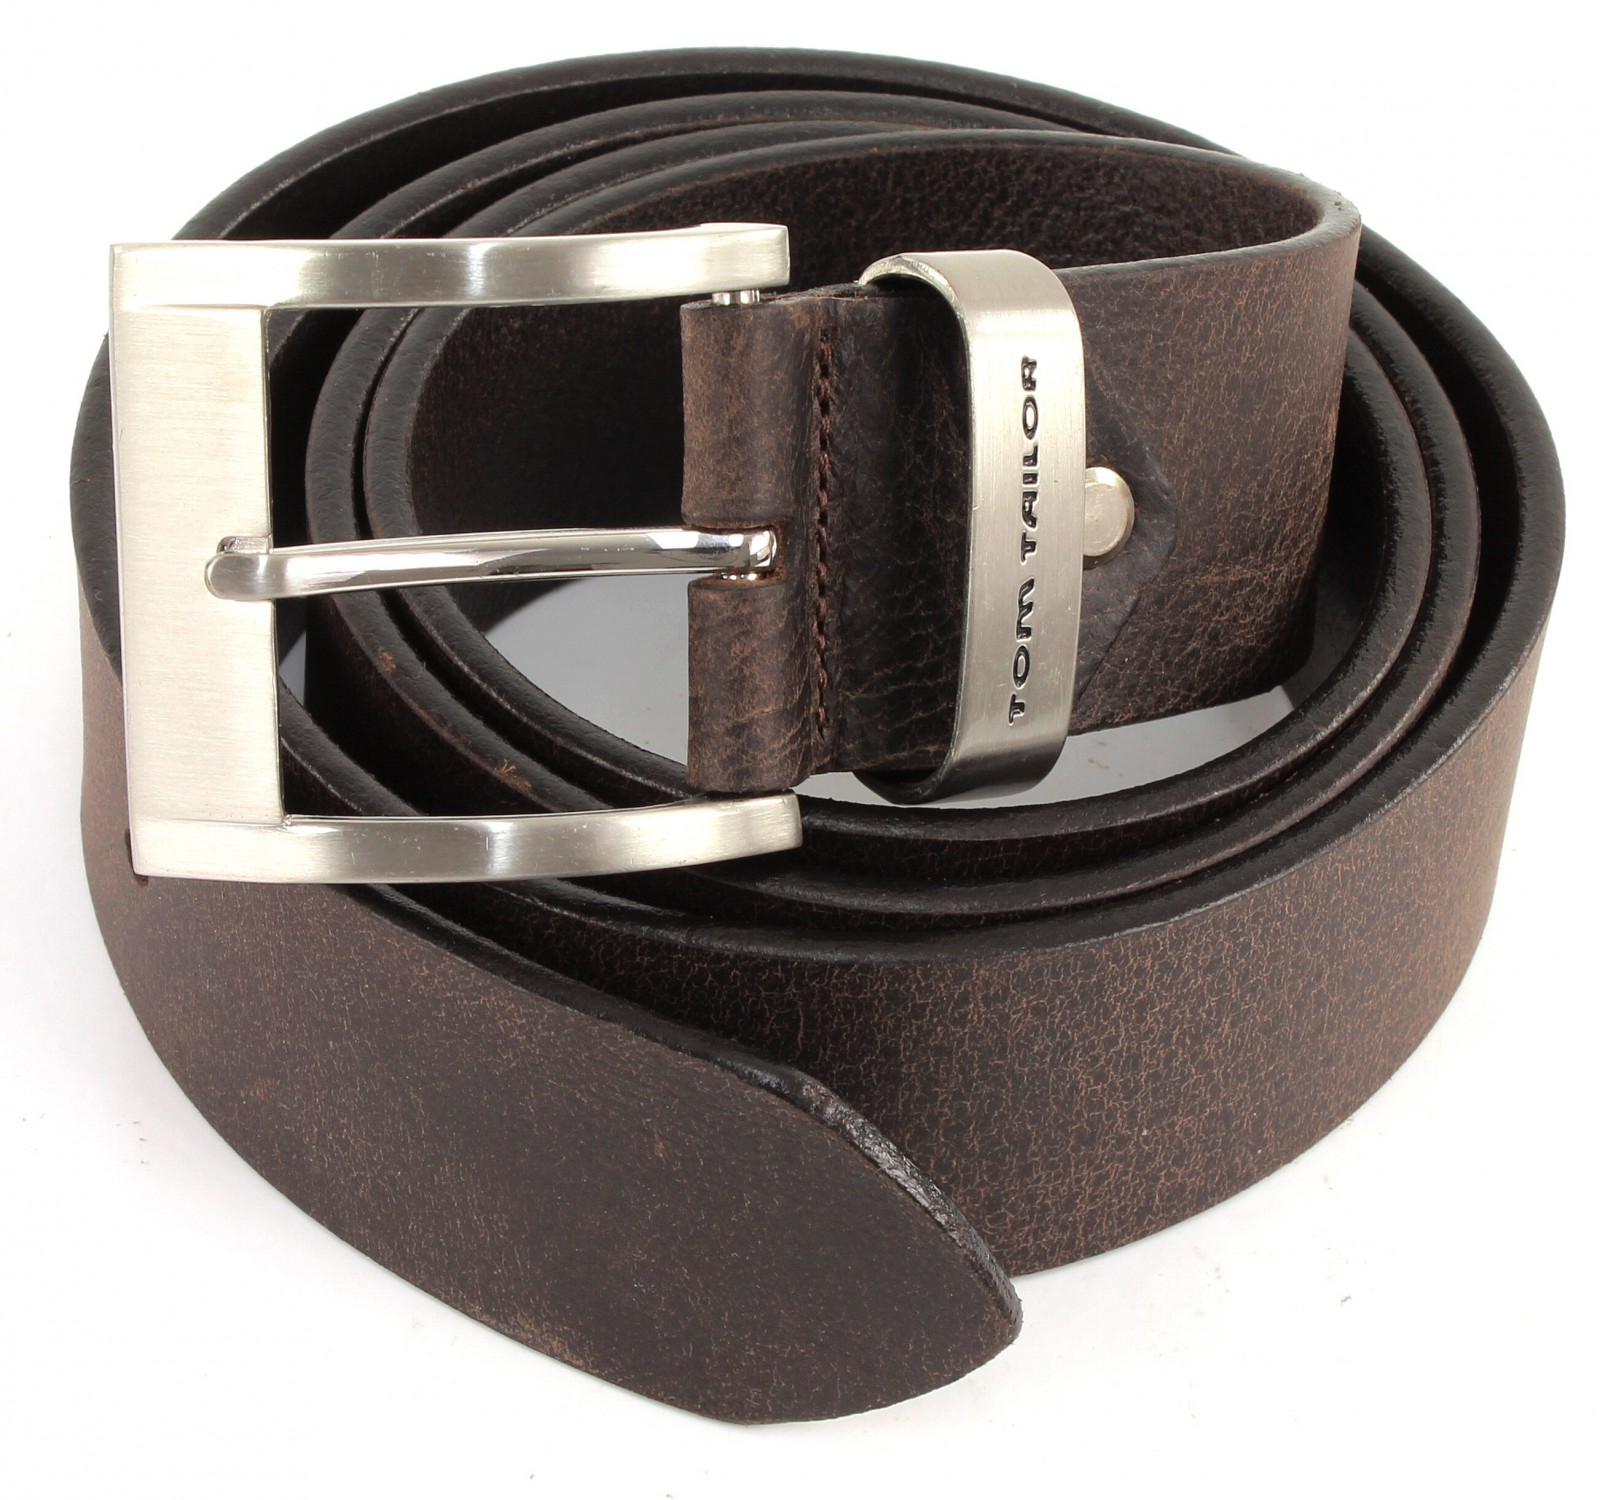 TOM TAILOR Belt TG1165H31 W115 Dark Brown